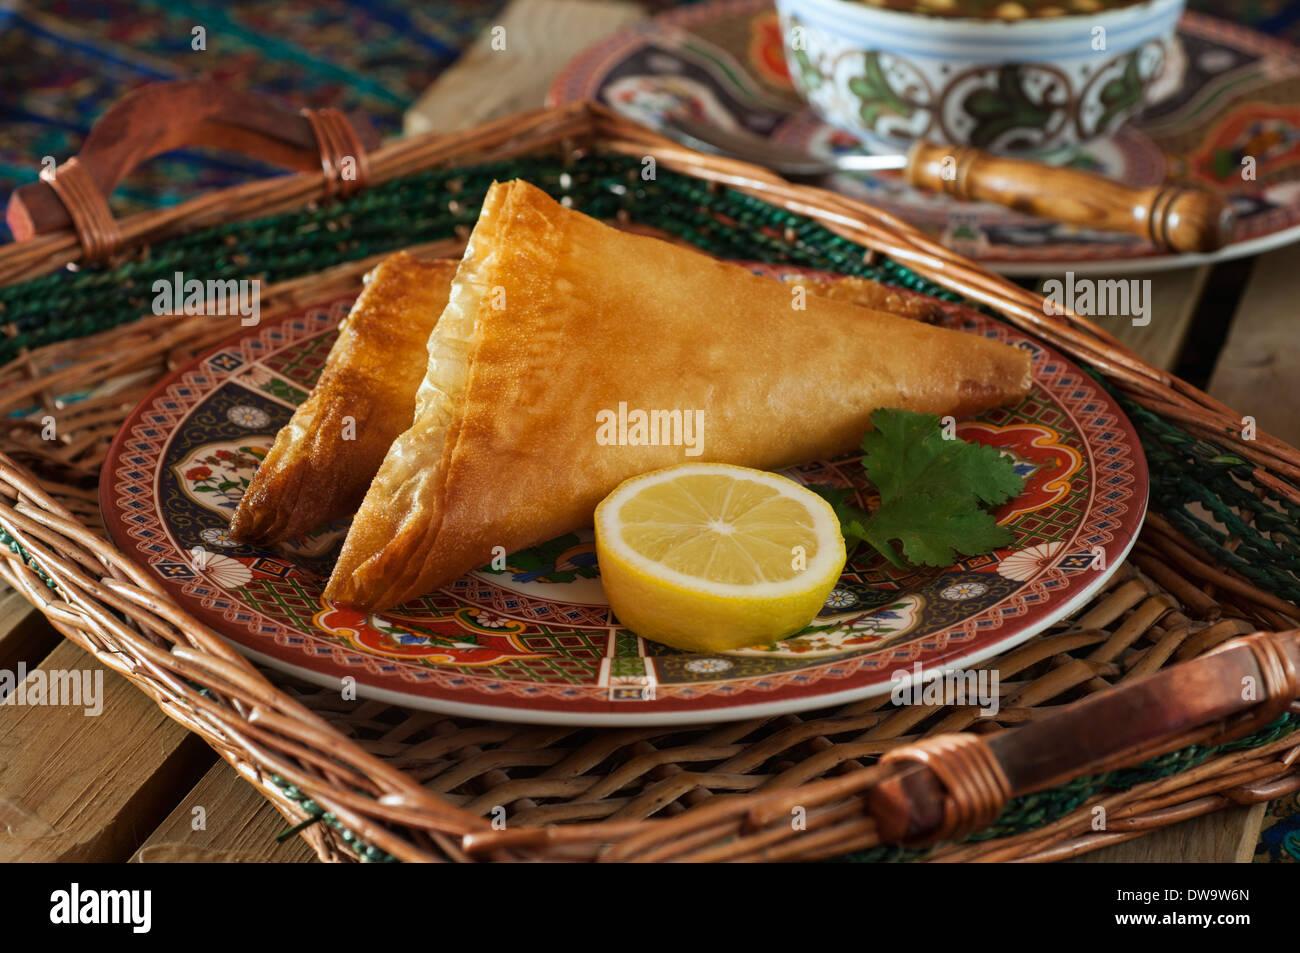 Brik à l'oeuf. Fritos pasteles tunecinos. Túnez alimentos Imagen De Stock